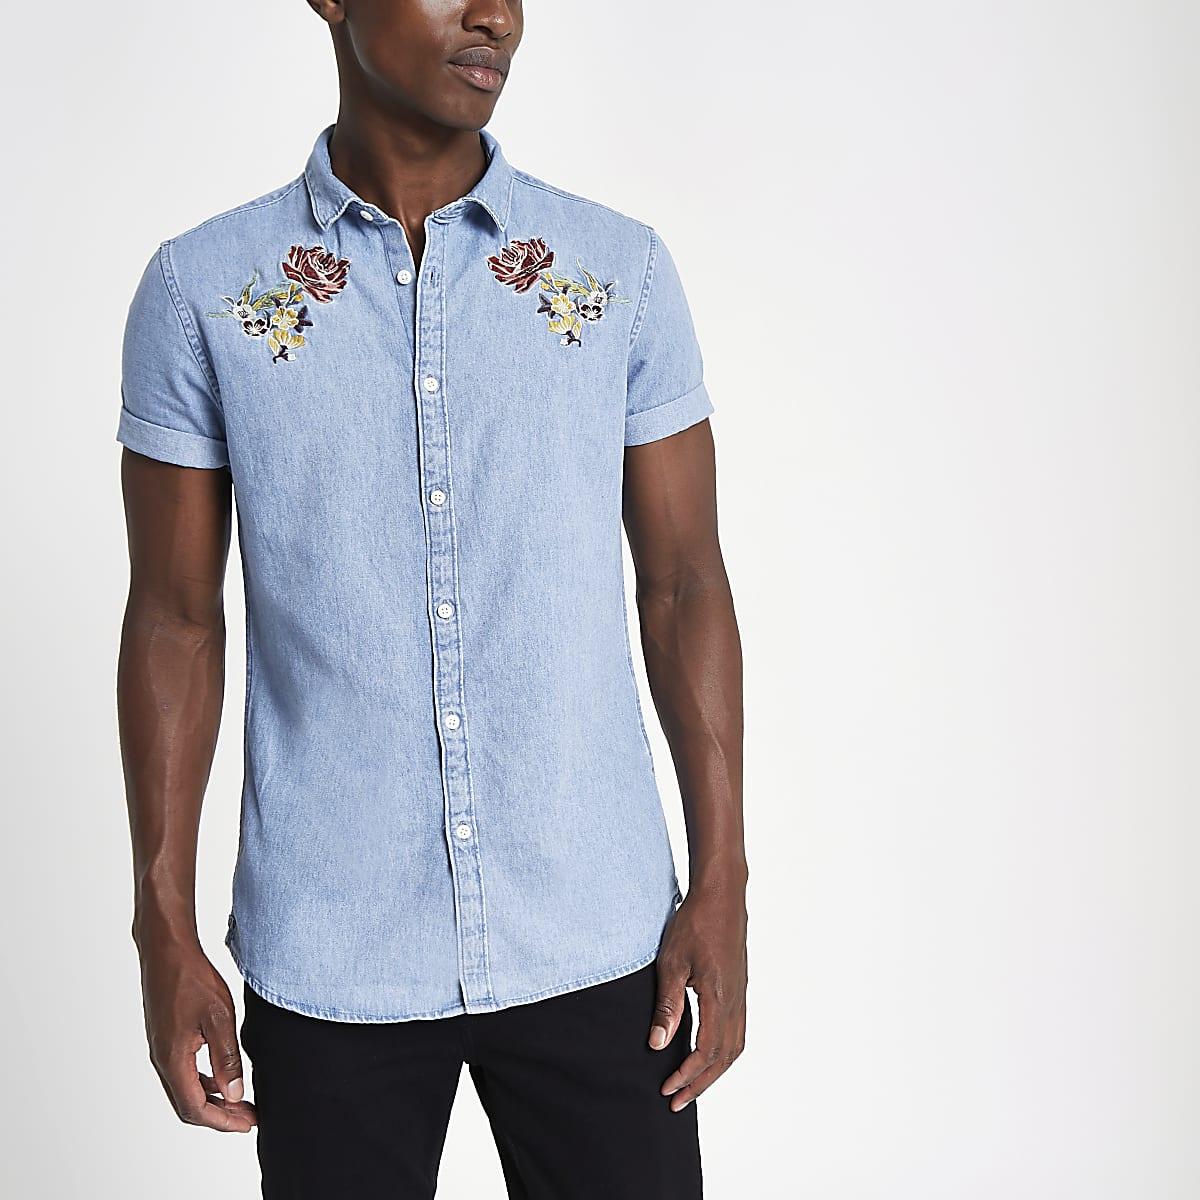 Slim Fit Denim Overhemd.Blauw Slim Fit Geborduurd Denim Overhemd Overhemden Met Korte